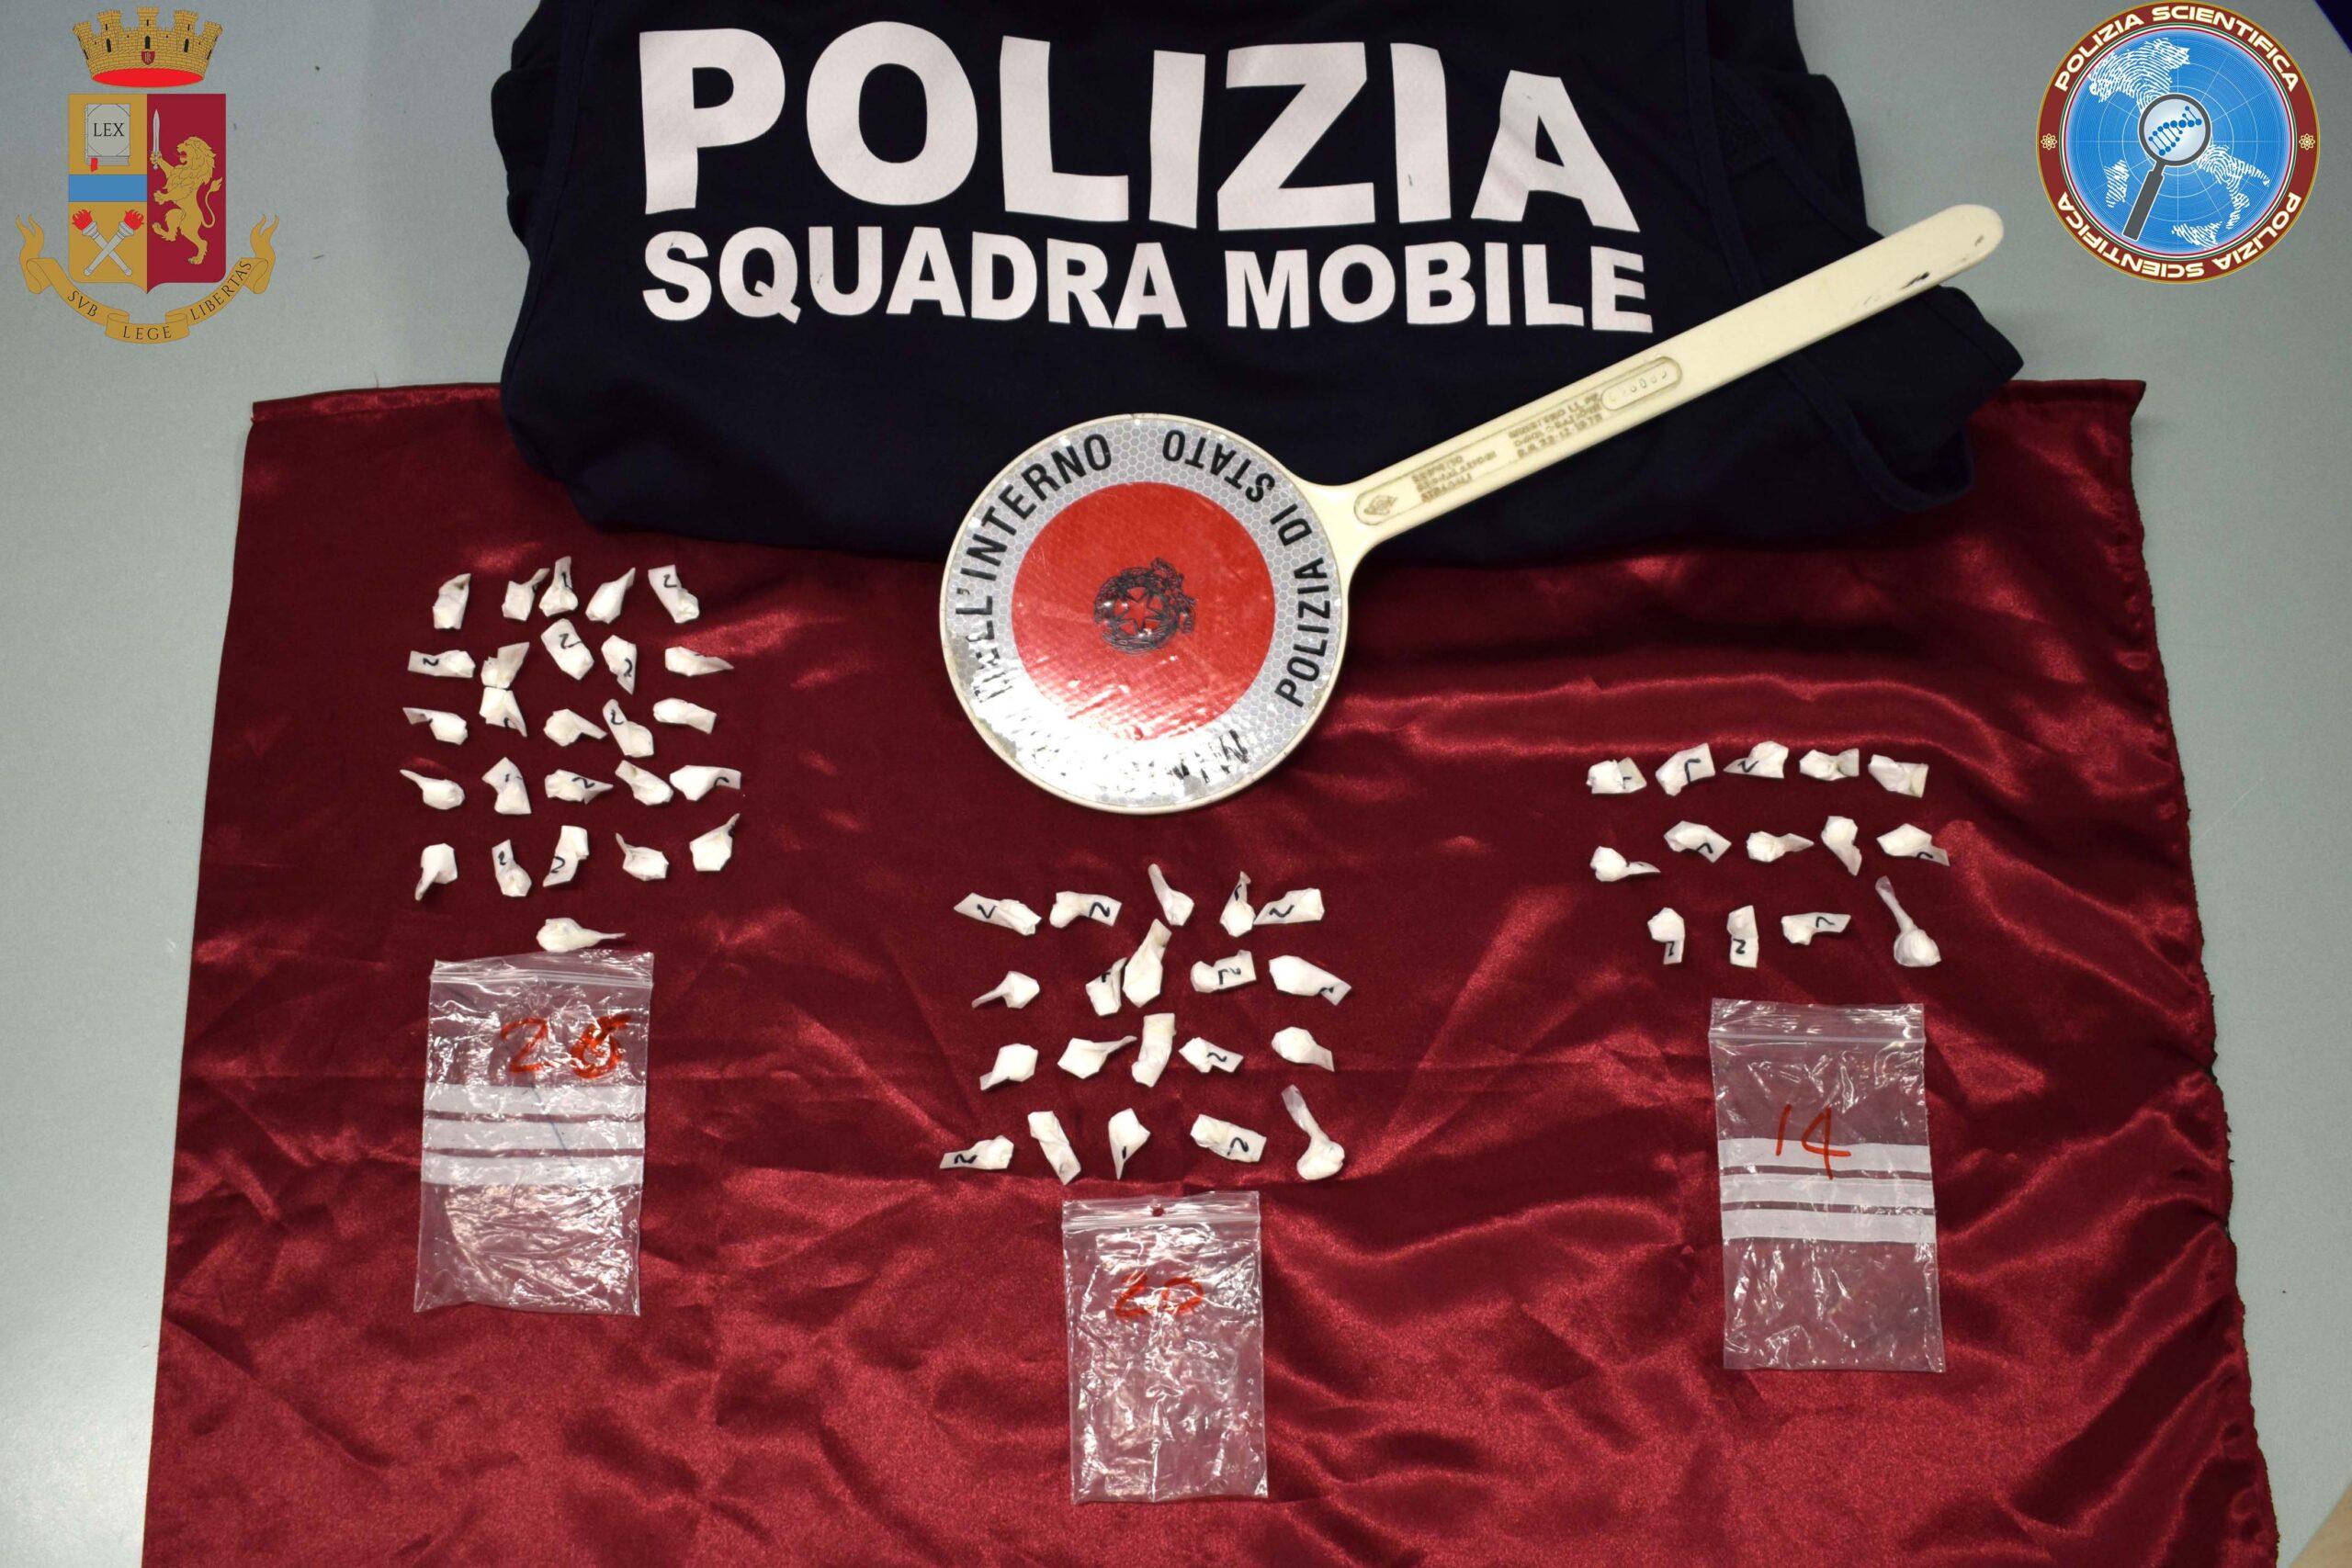 POLIZIA, ARRESTATI DUE SPACCIATORI DI COCAINA